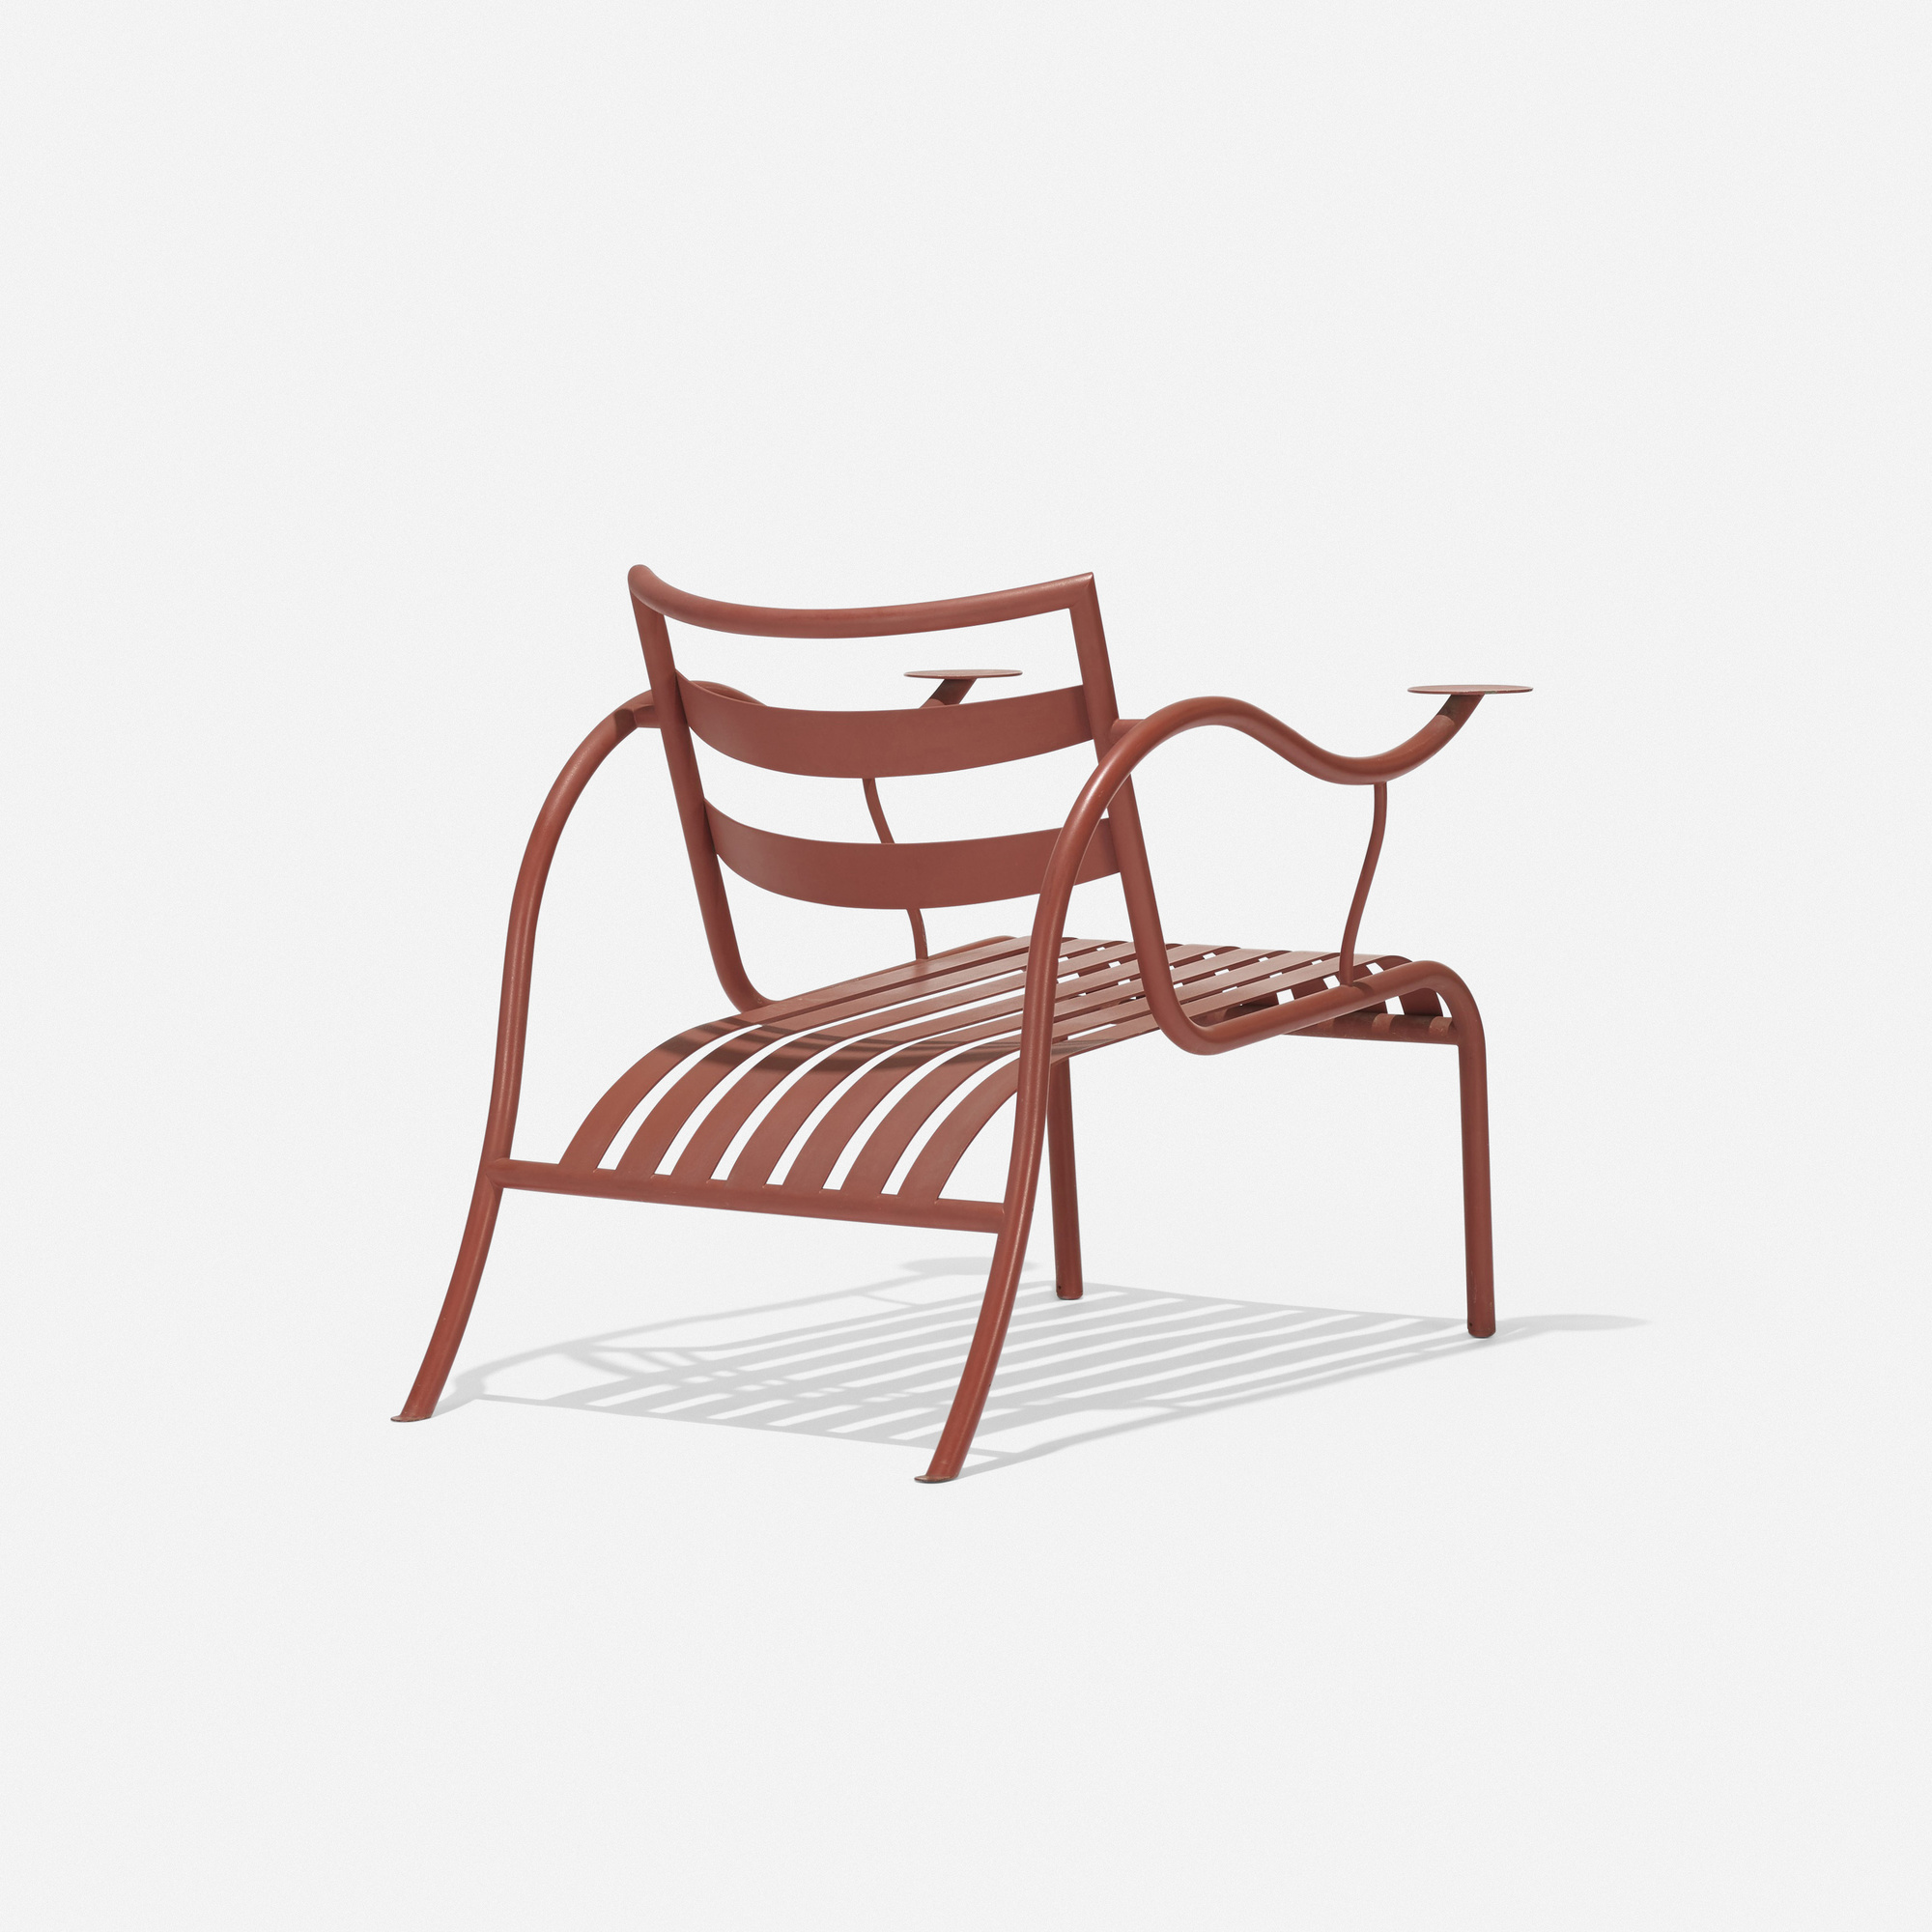 339: Jasper Morrison / Thinking man's chair (2 of 2)